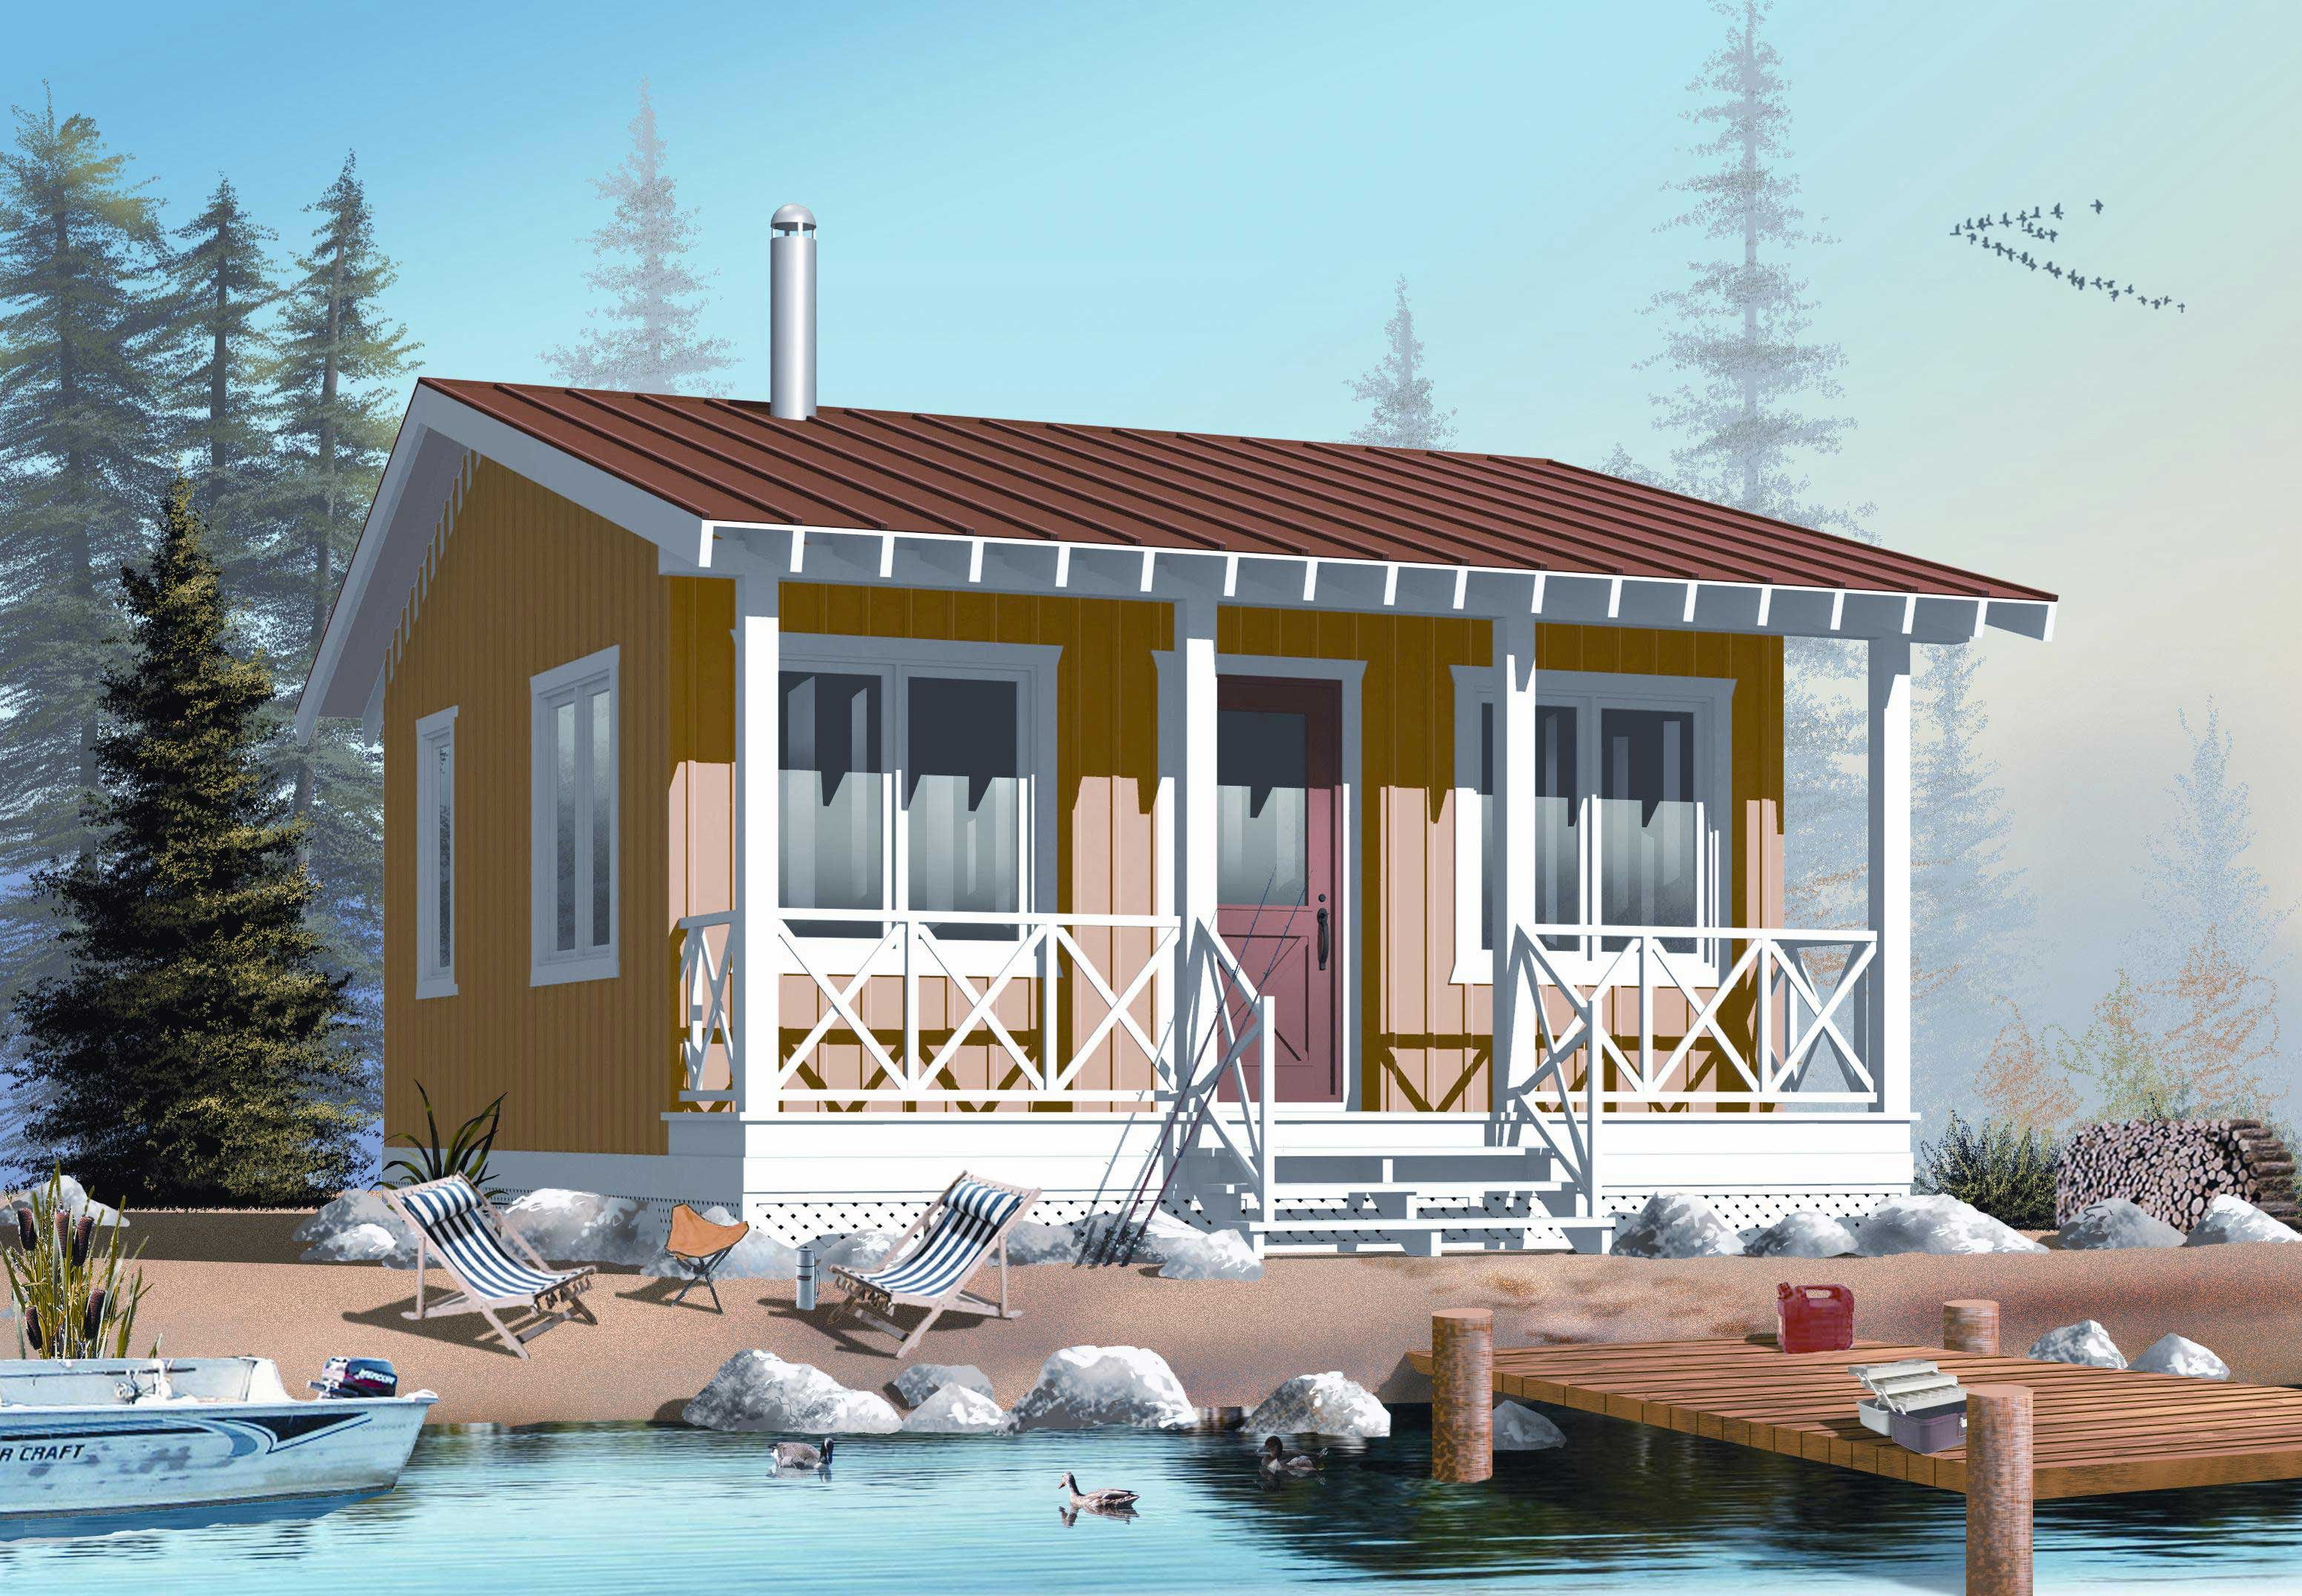 Small House Plan / Tiny Home 1 Bedrm, 1 Bath 400 Sq Ft 1261022 - Unique 550 Sq Ft Small House Tiny House Design Concept By FabCab YouTube